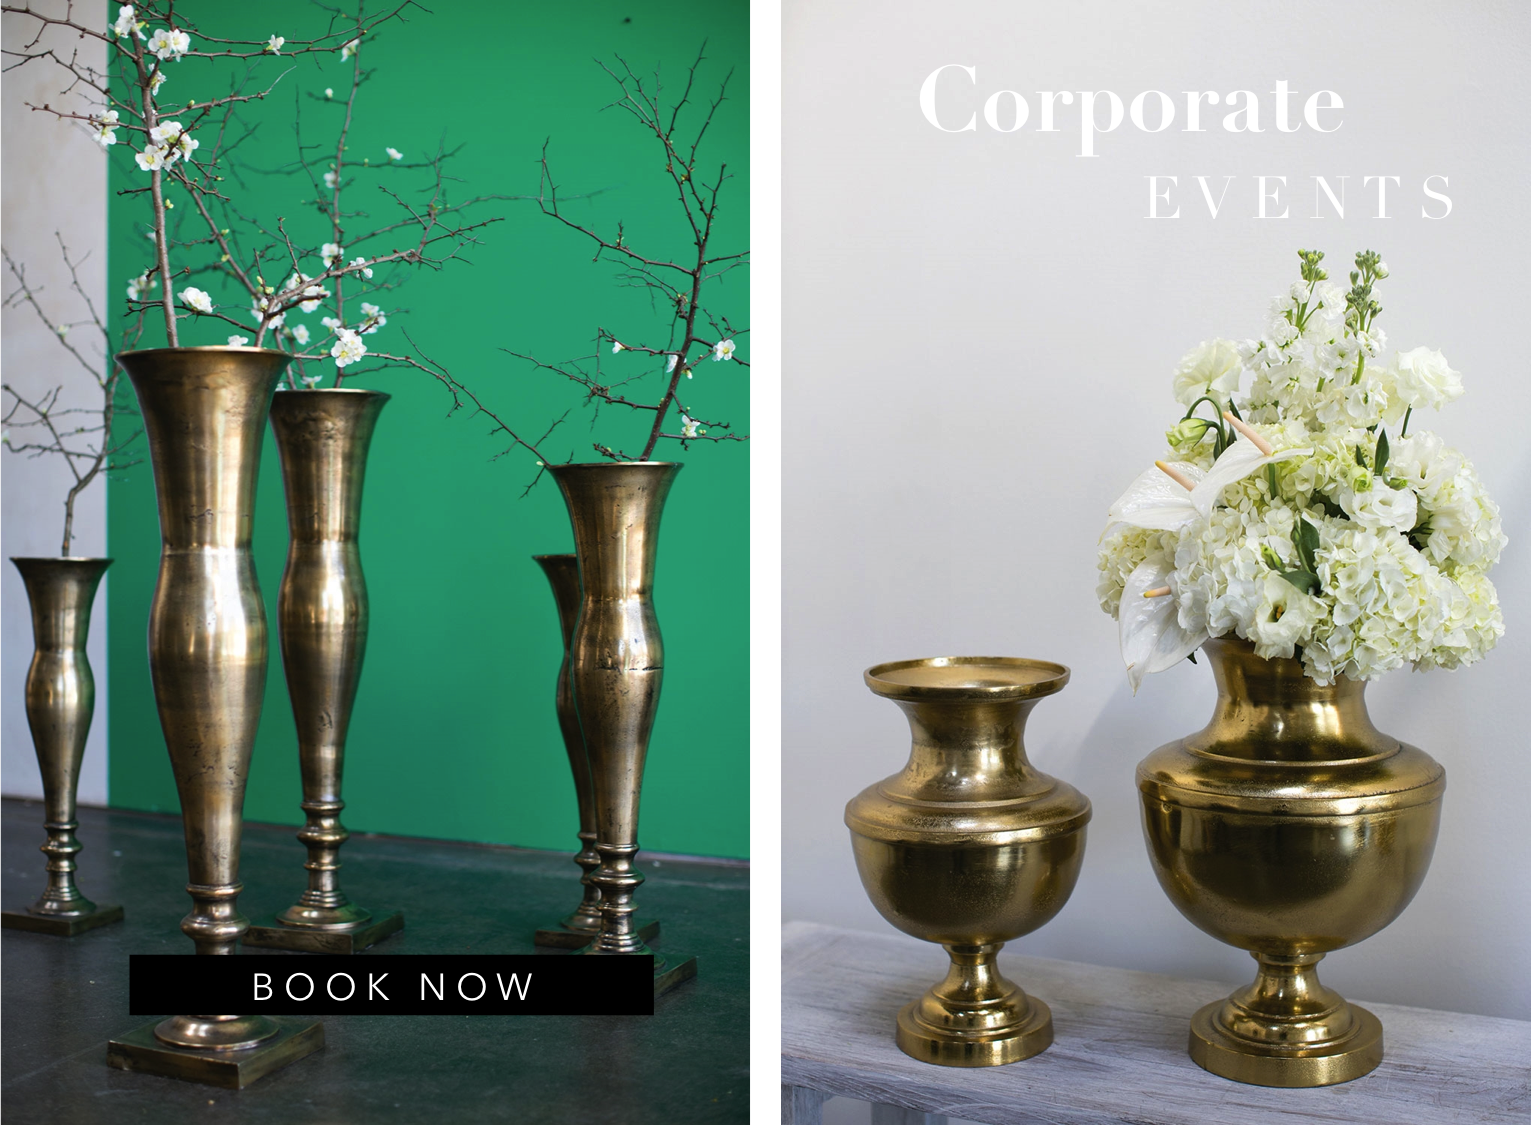 event-rentals-angies-79912-floral-designs-party-rentals-wedding-rentals-chairs-linens-vases-wedding-el-paso-bodas-rentas-de-eventos-79912-flowershop-bridal-shop-event-angies-flower-destination-corporate-event.png